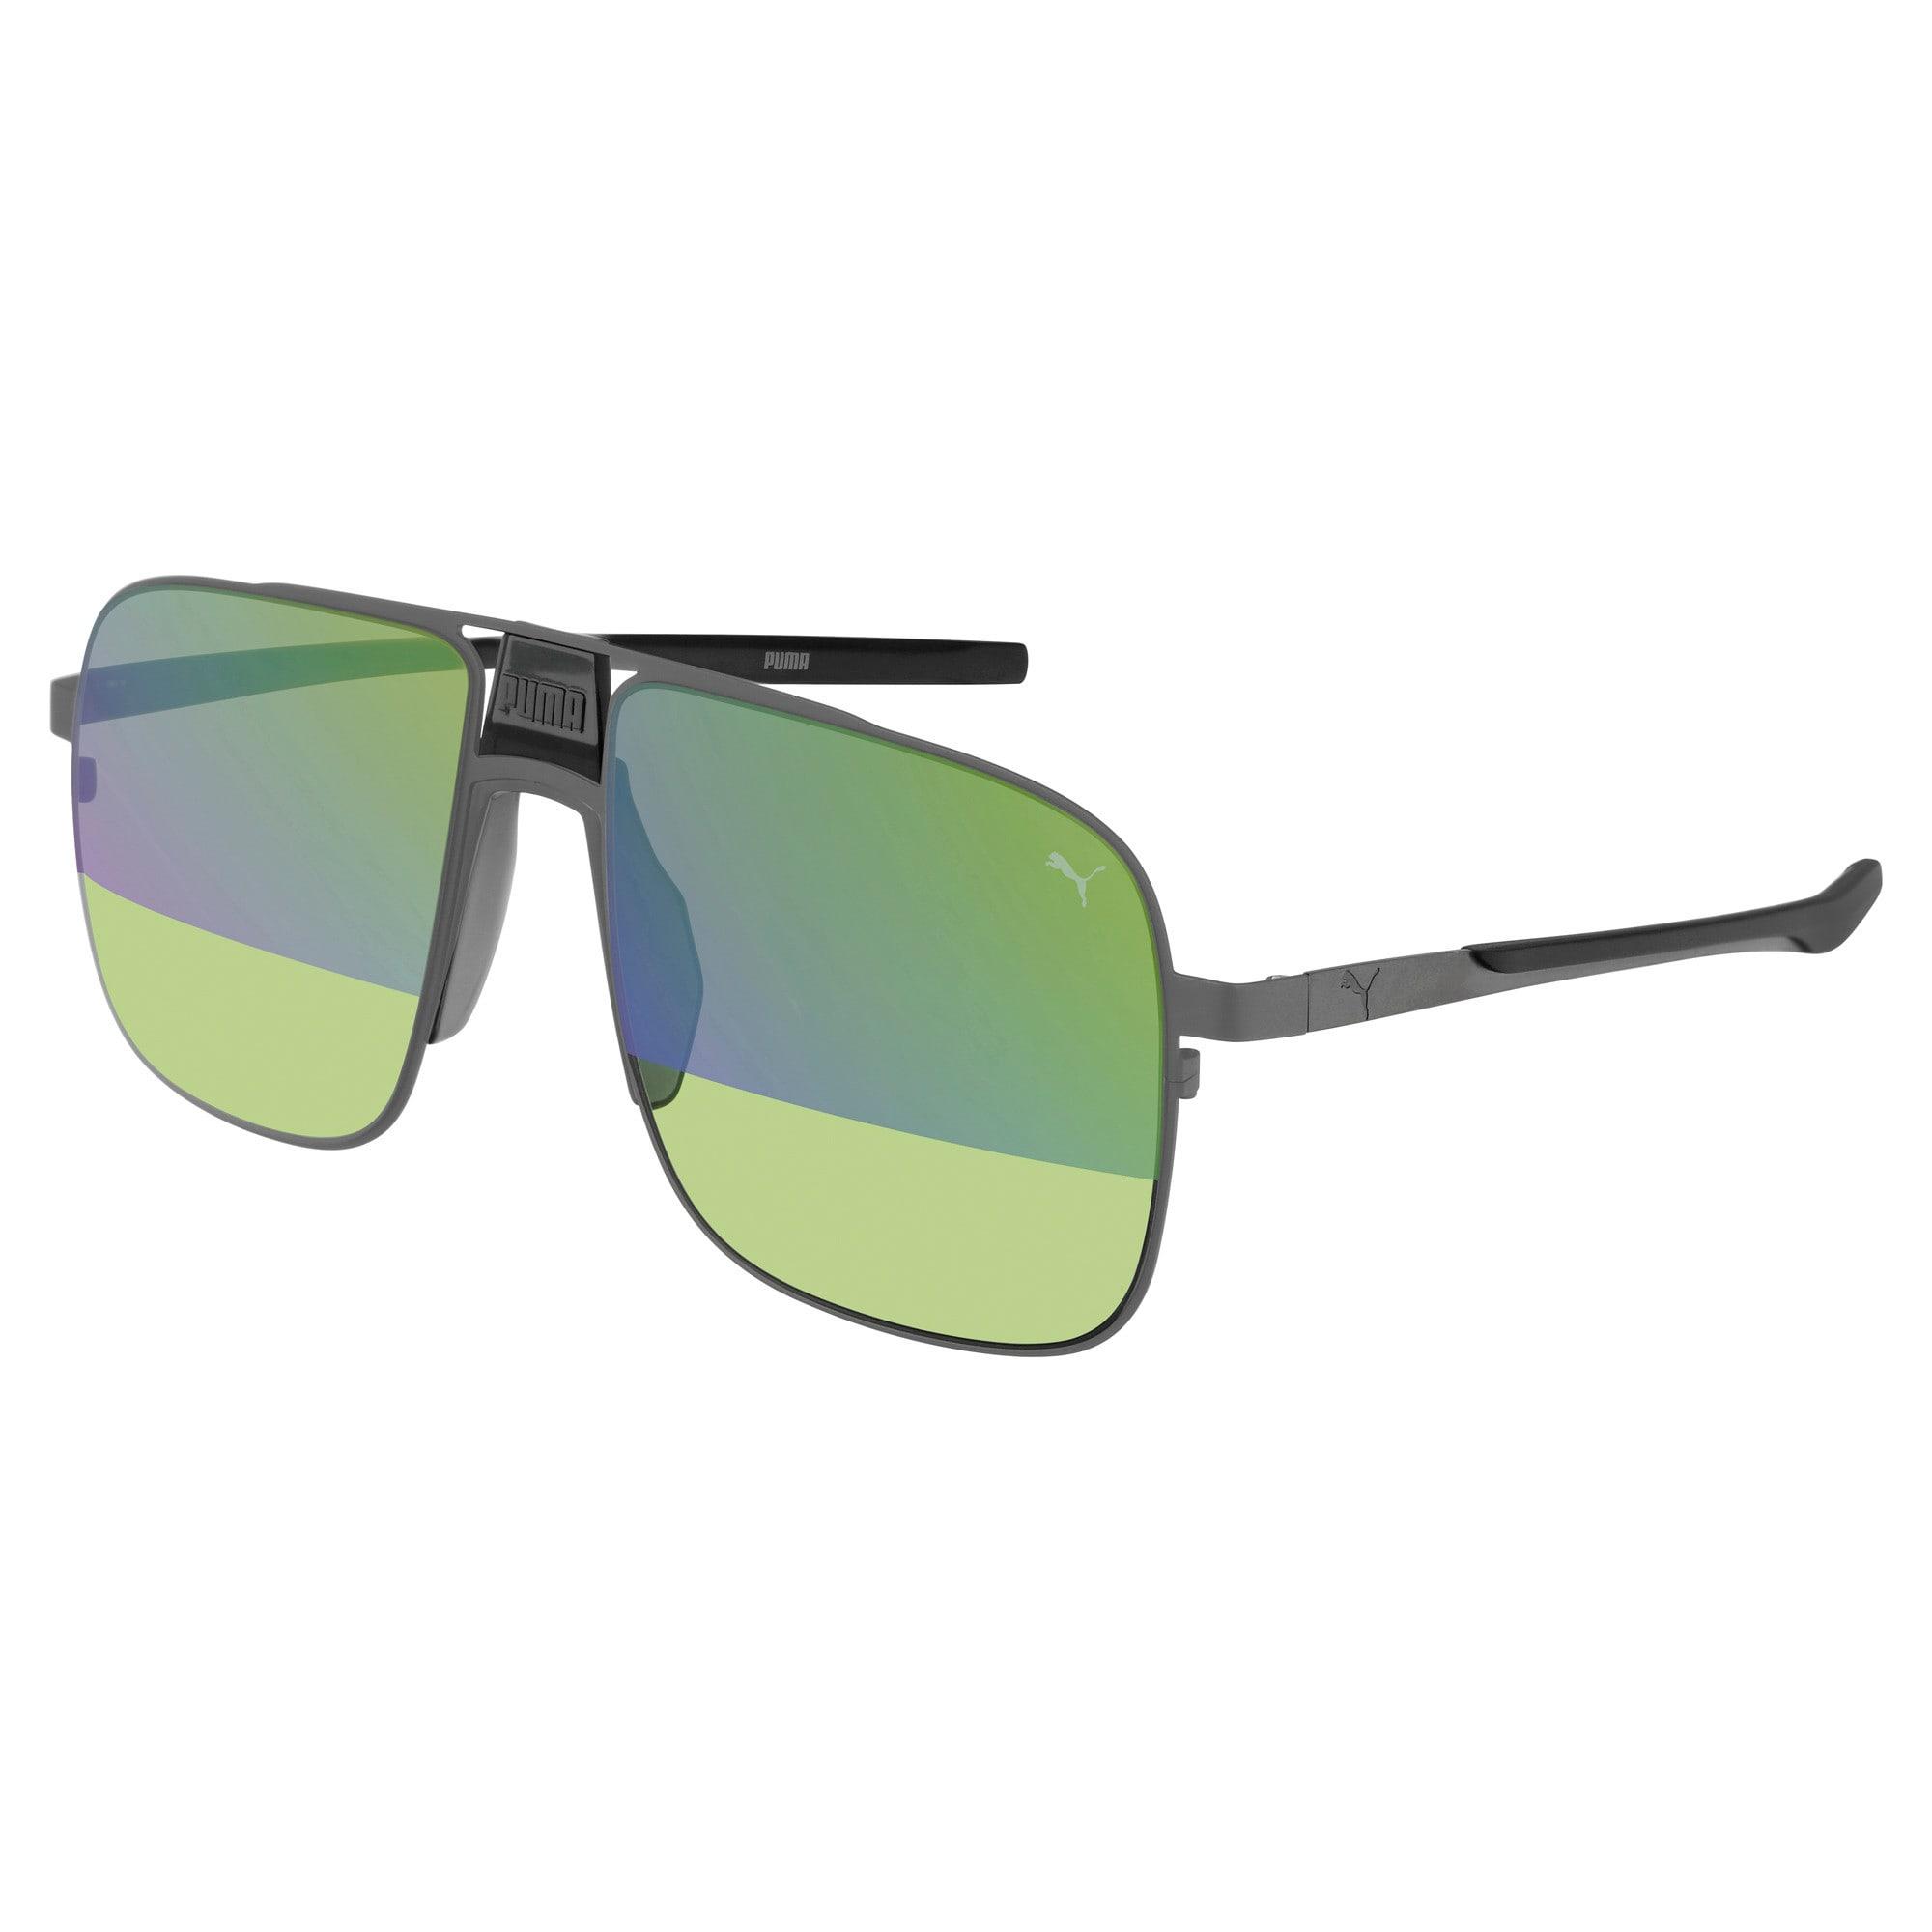 Thumbnail 1 of Men's Sunglasses, RUTHENIUM-RUTHENIUM-GREEN, medium